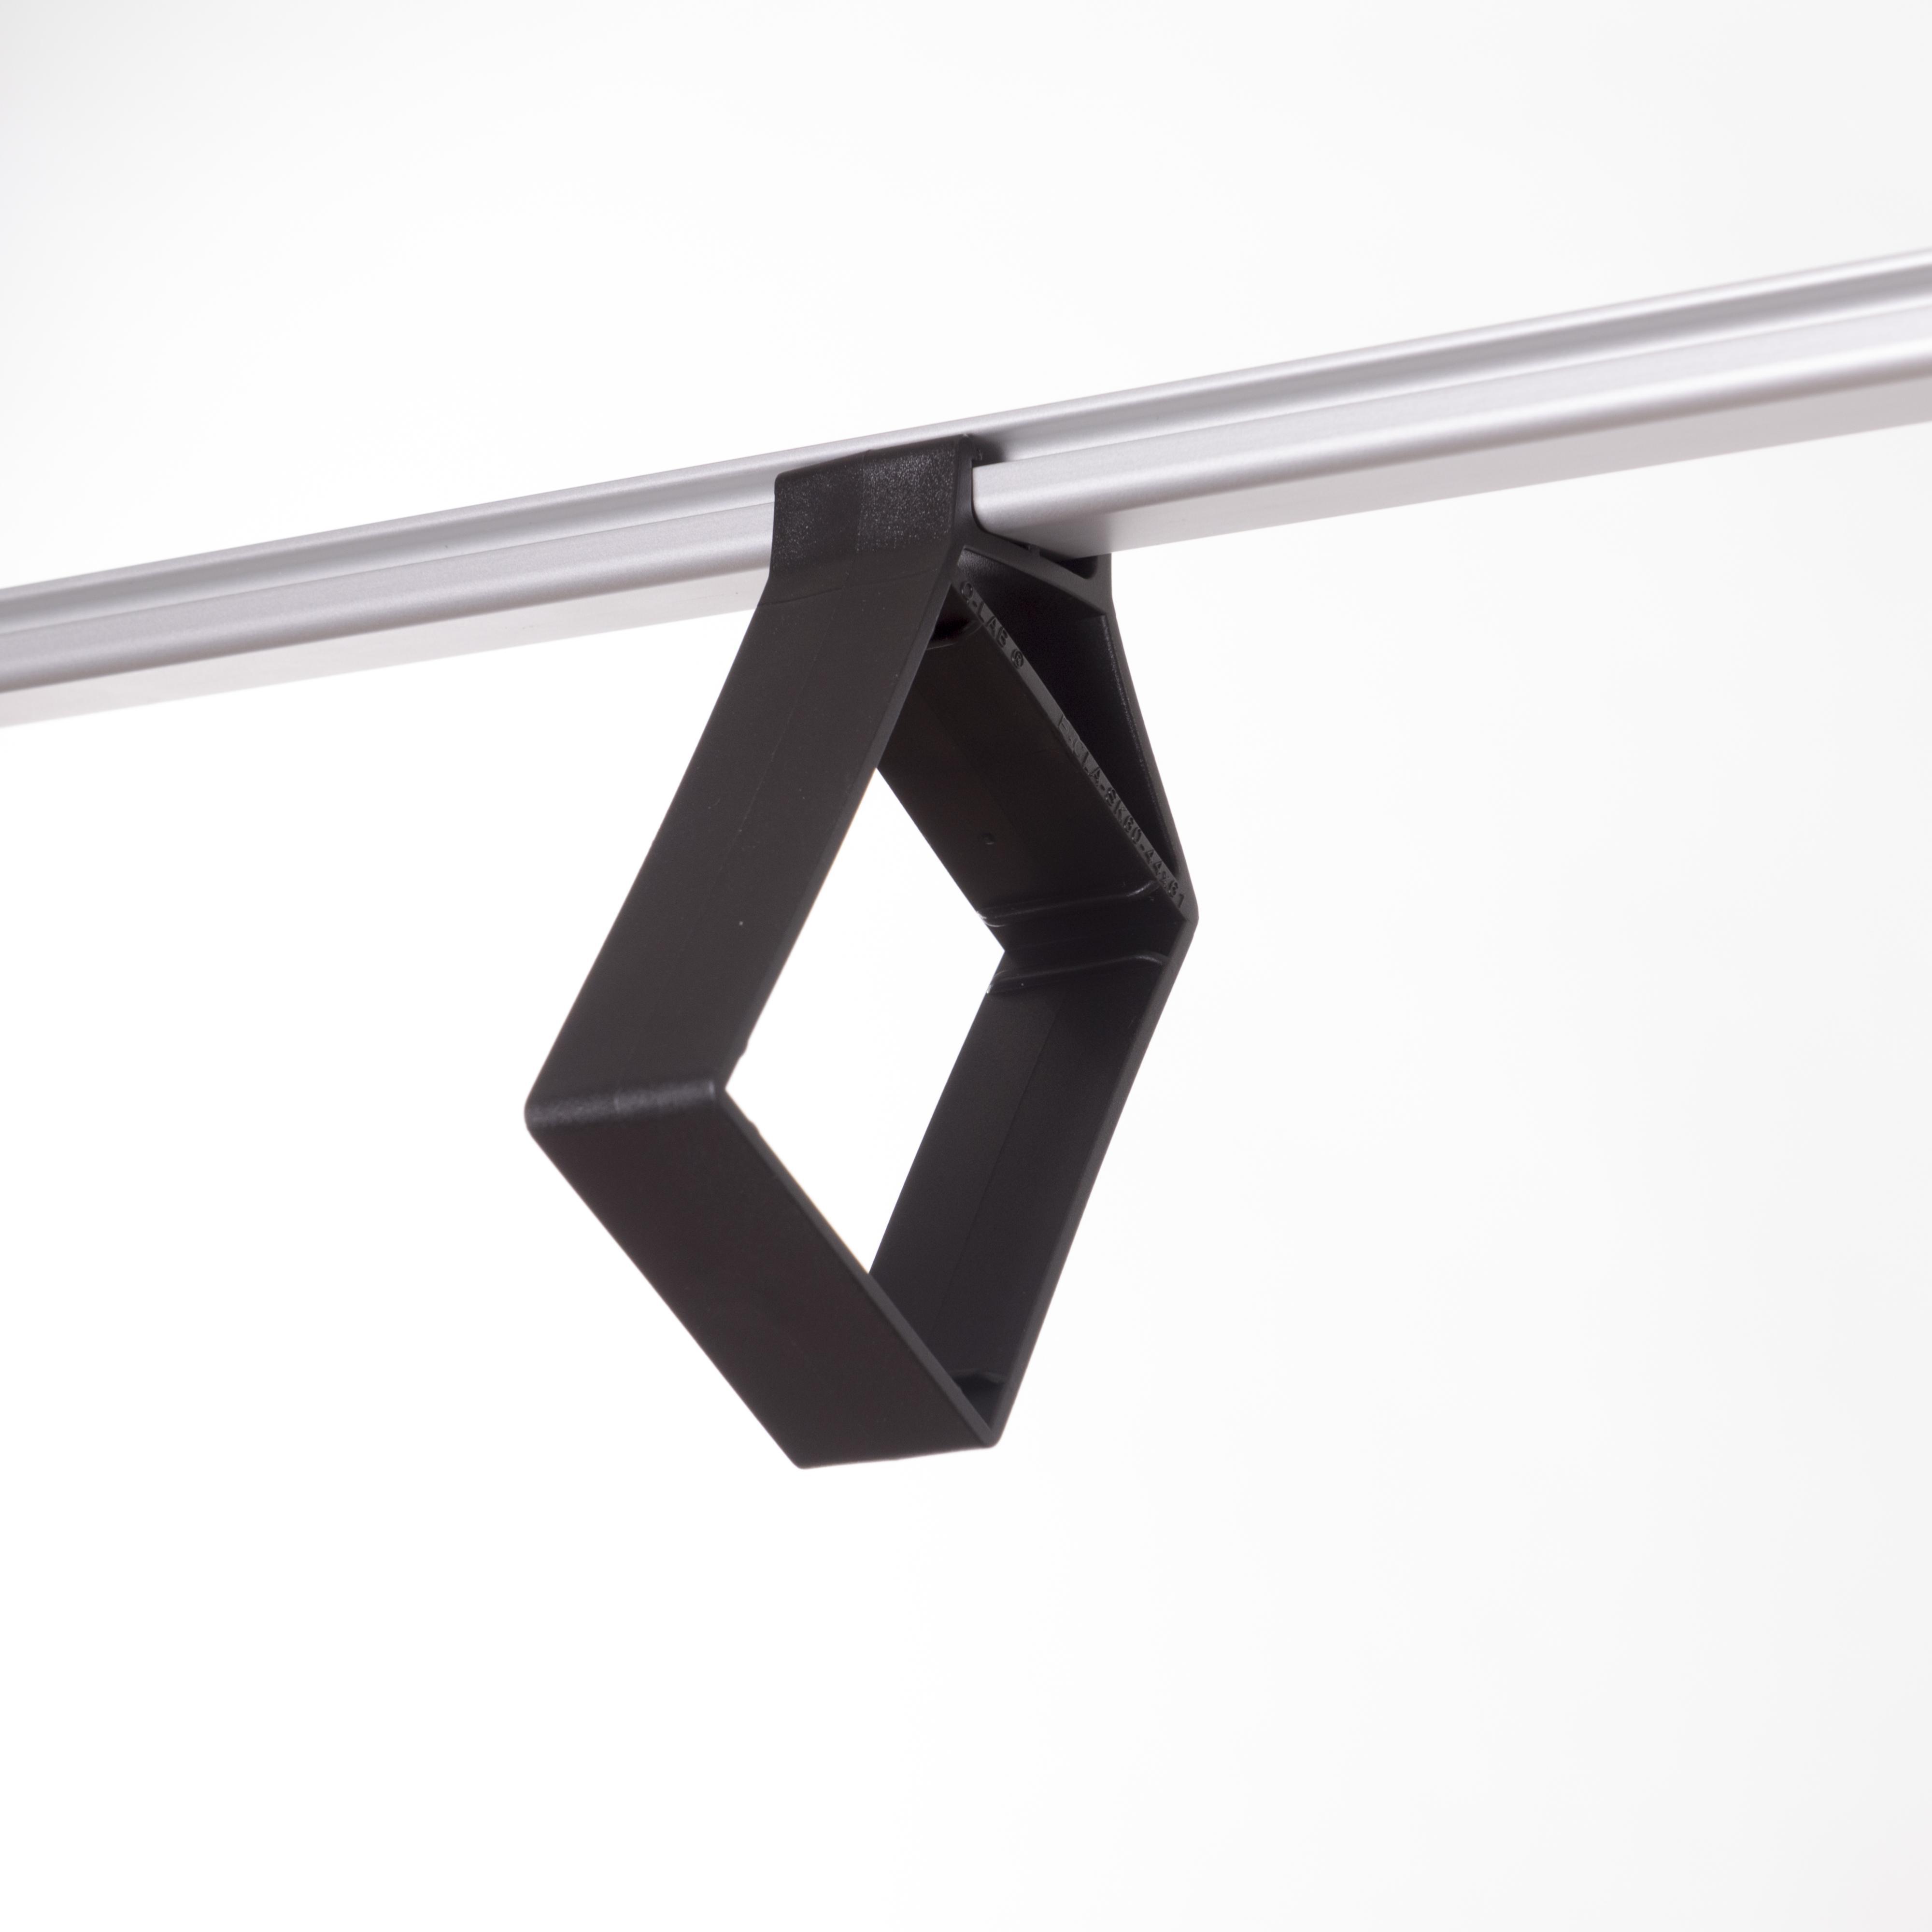 powerbox-clamp-2.jpg